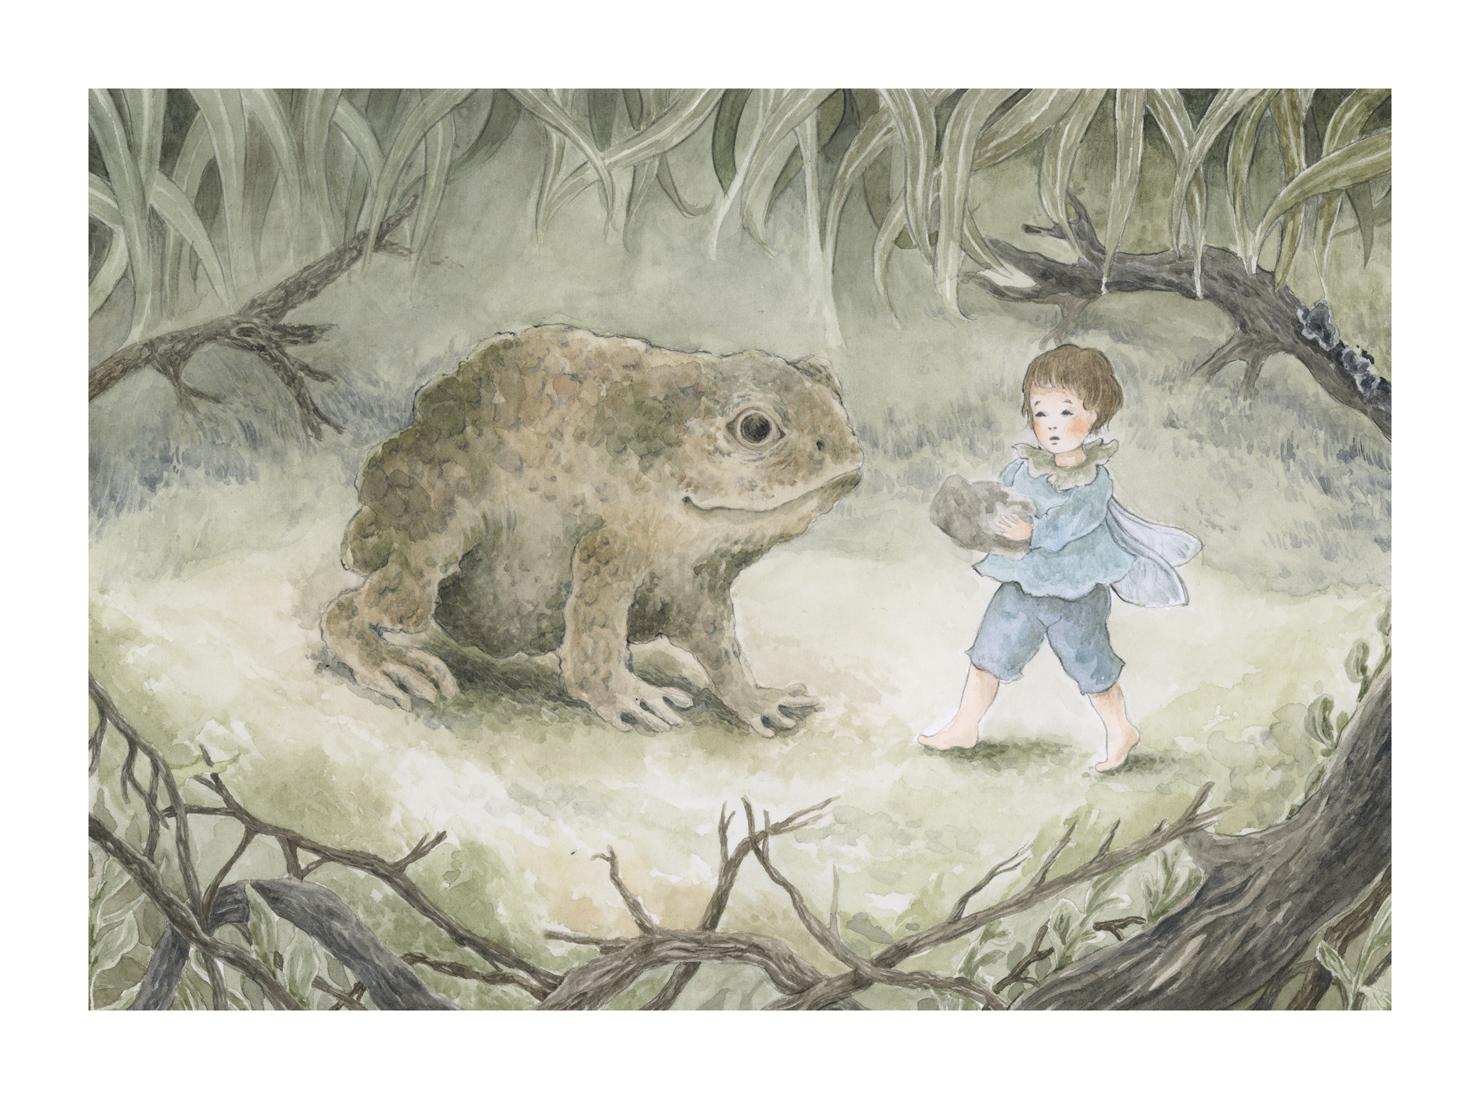 Frog_web_2.jpg